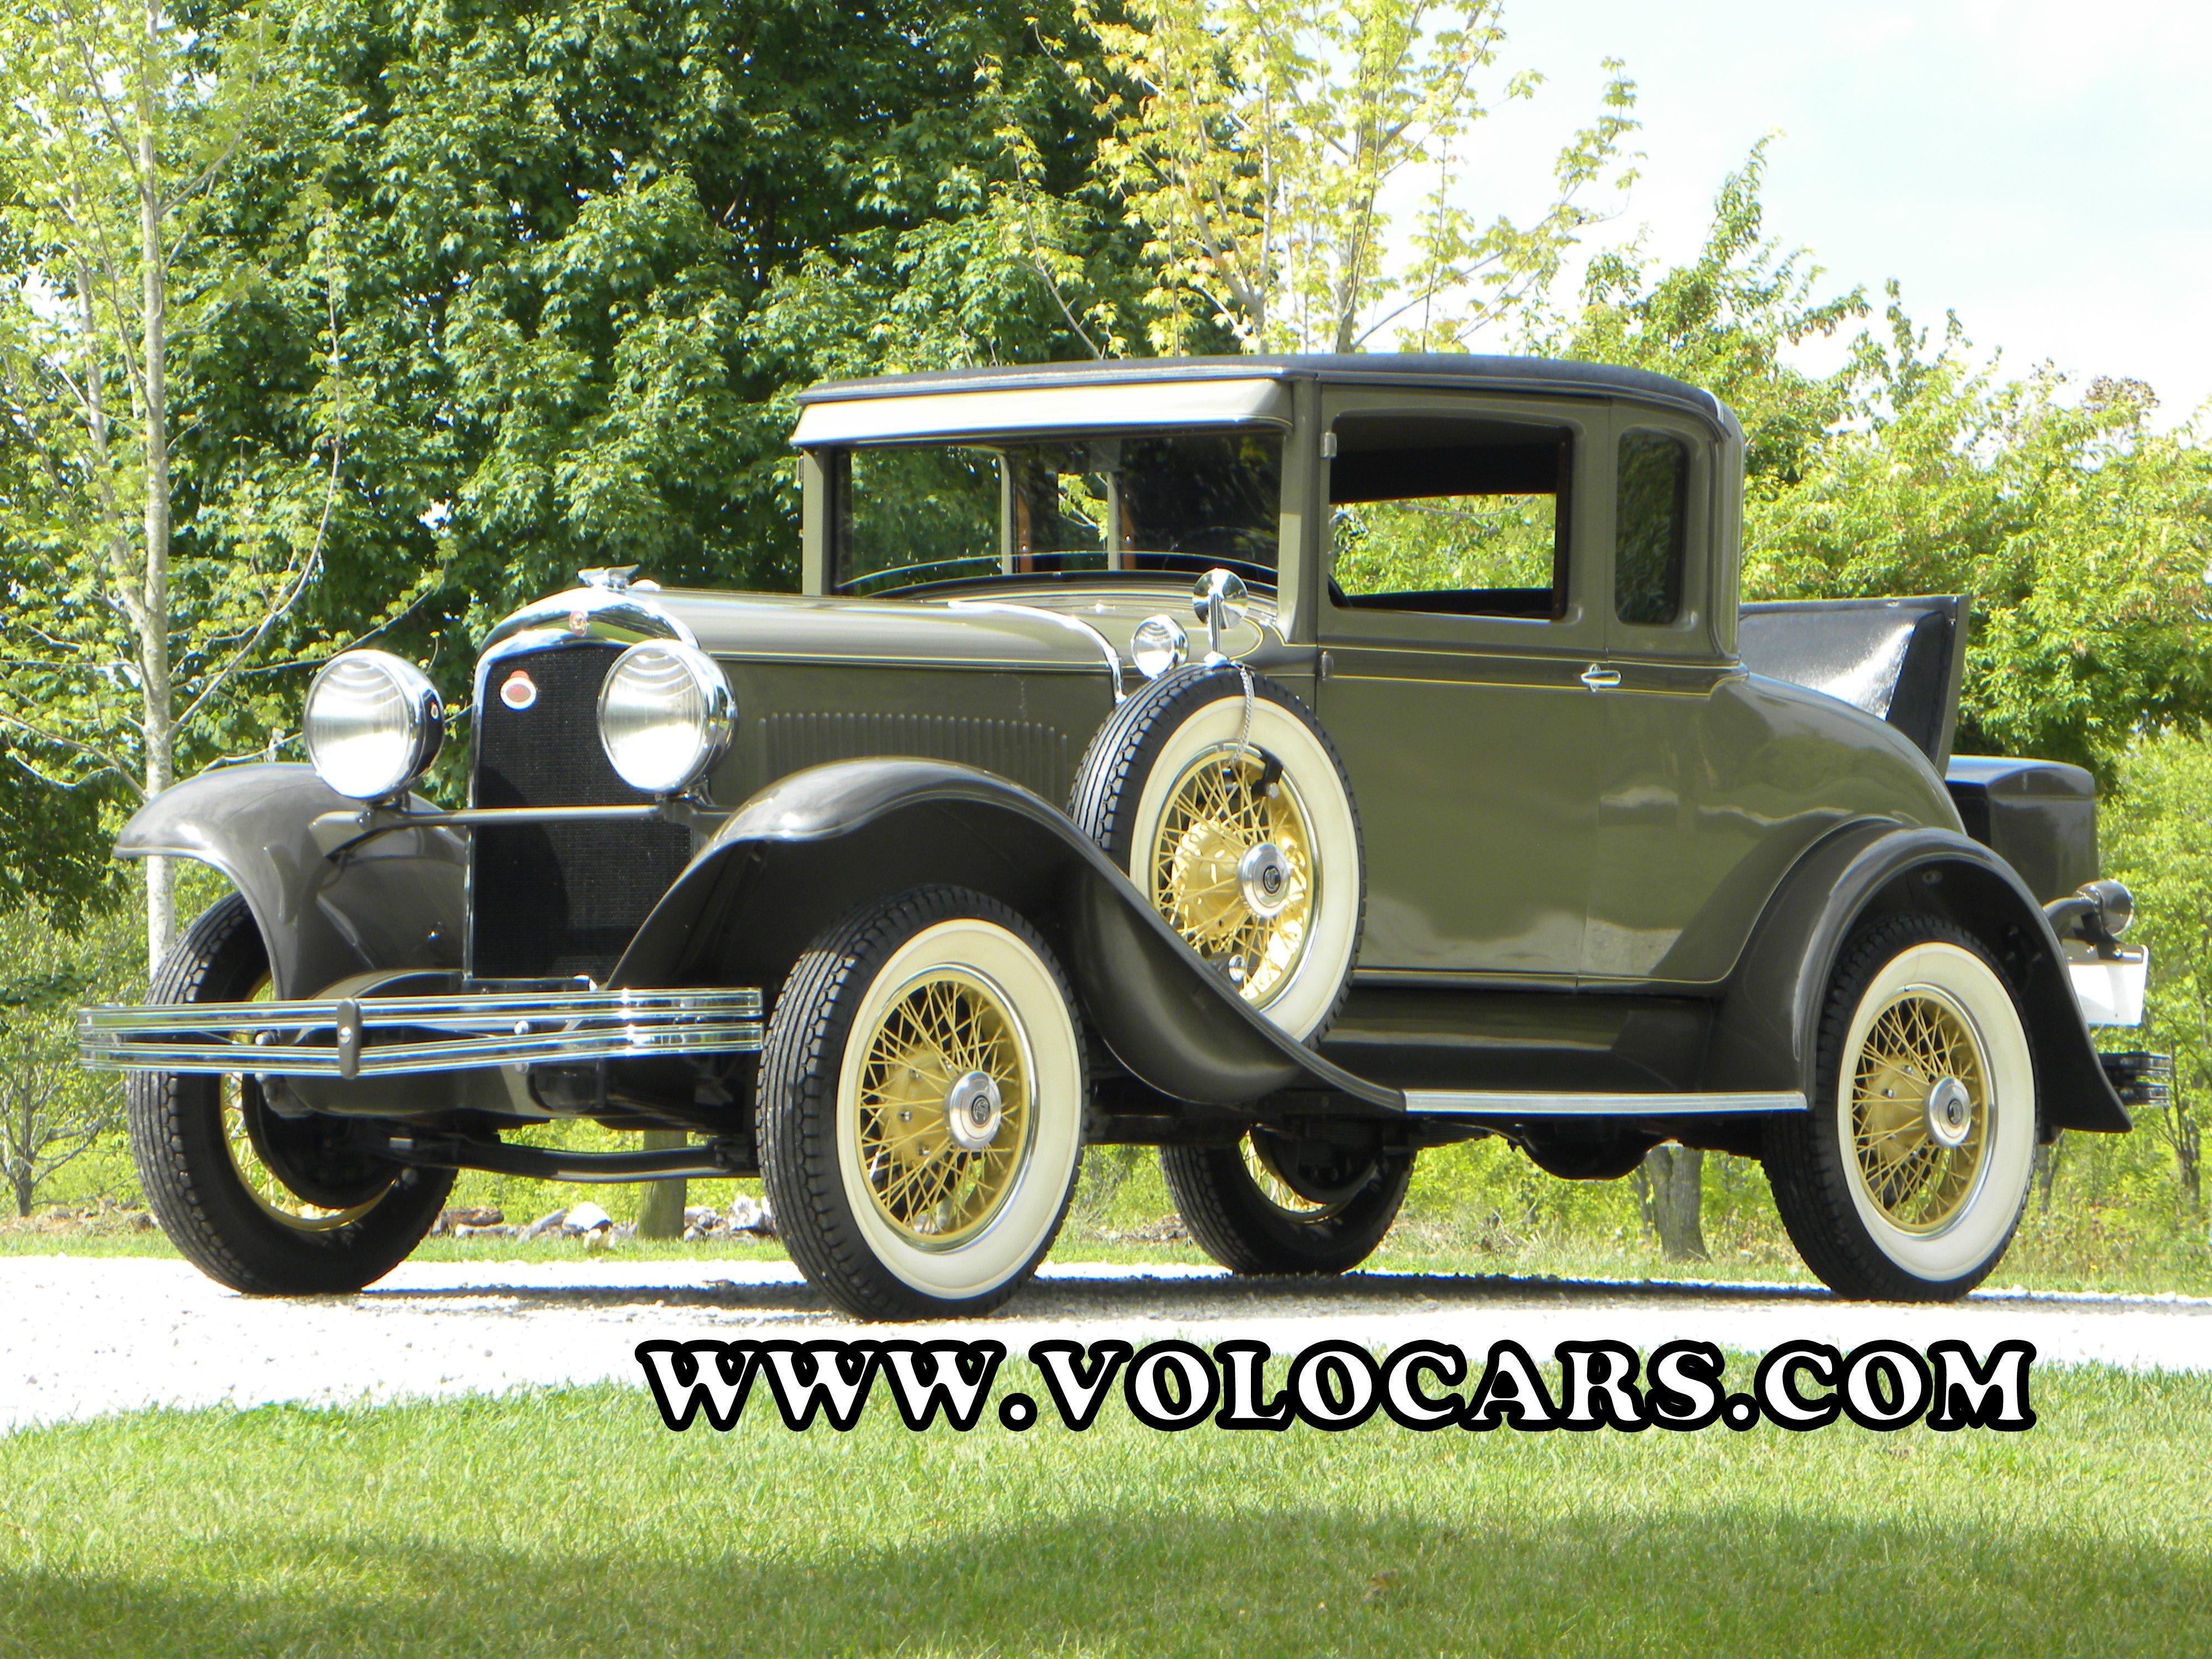 1929 Chrysler Series 65